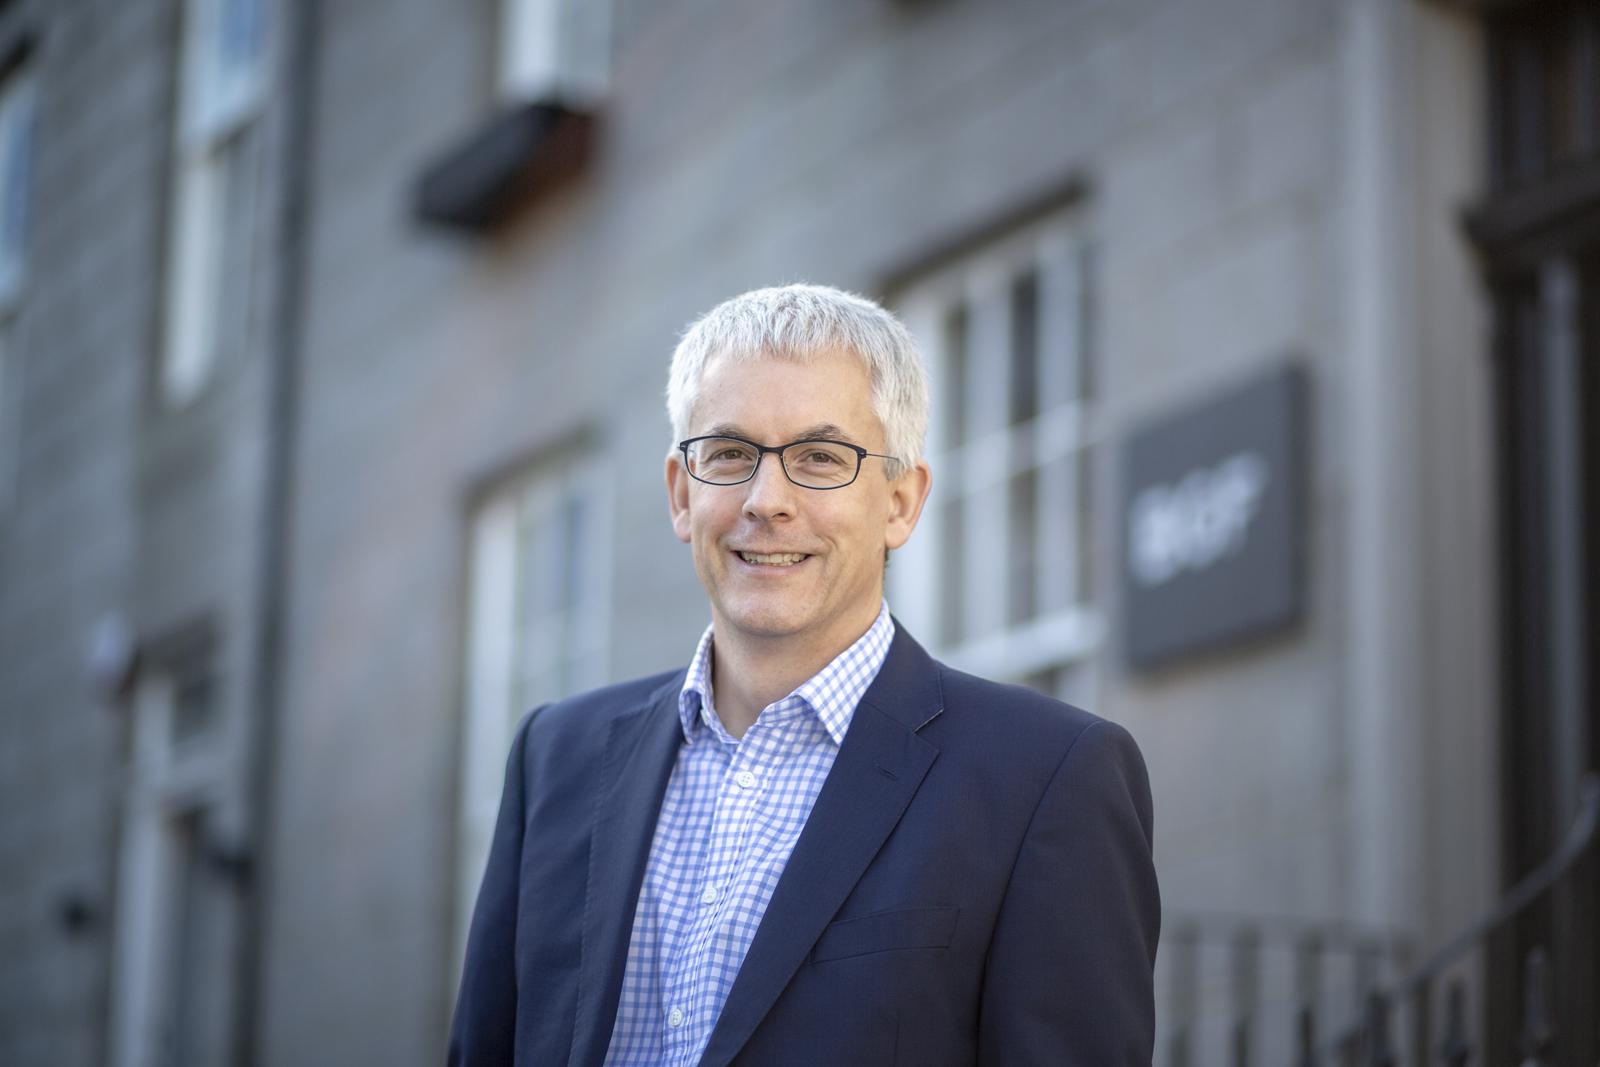 Mike Sibson, head of BGF's Aberdeen branch